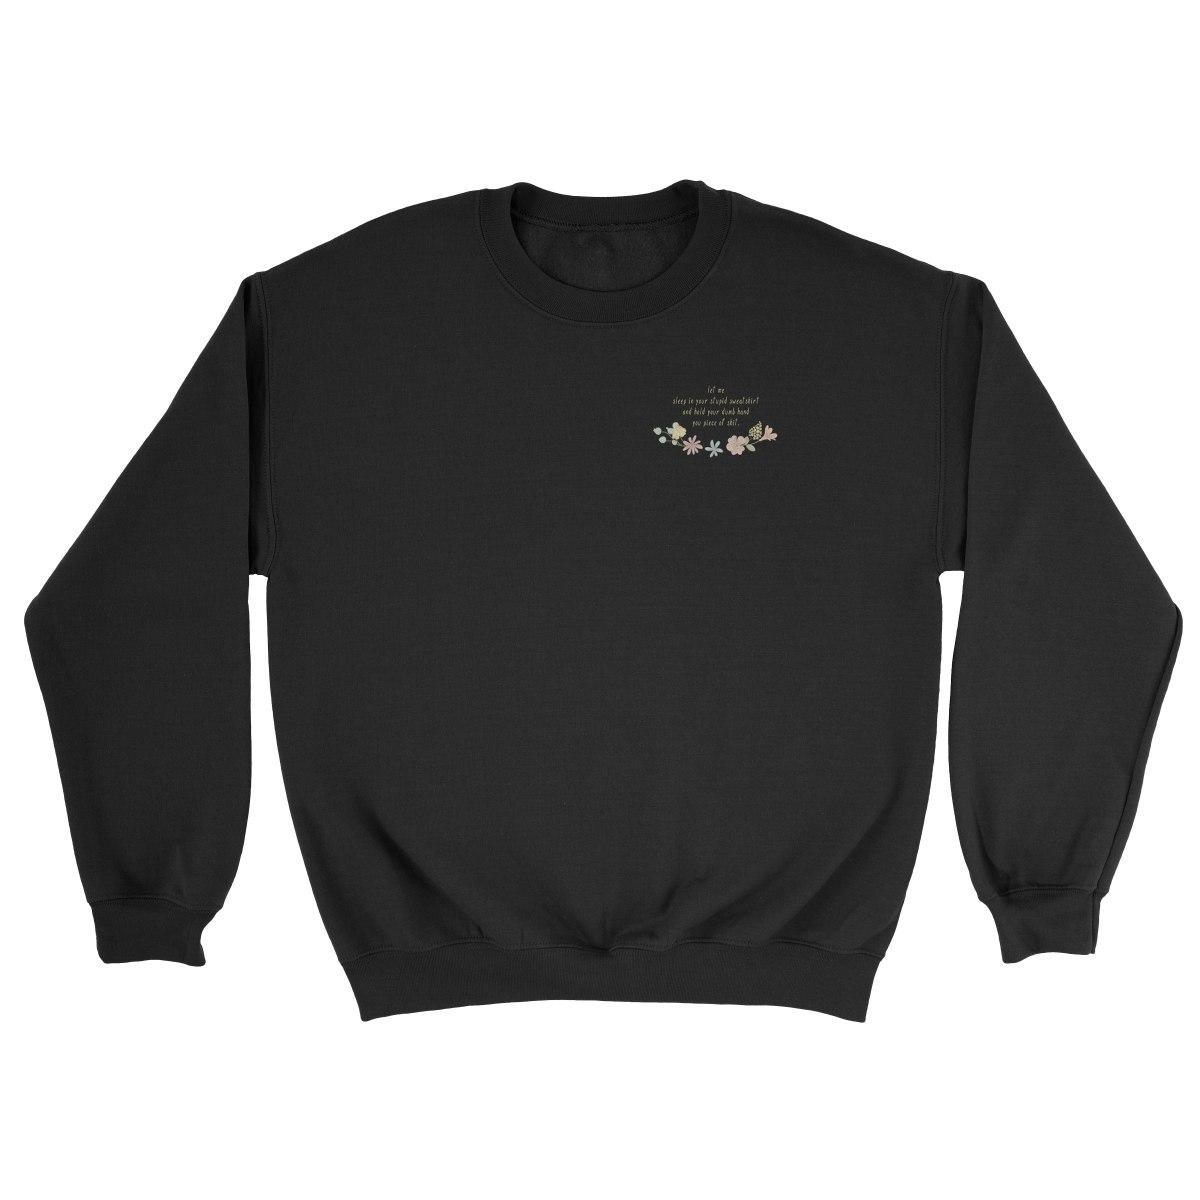 YOUR STUPID SWEATSHIRT black crew sweatshirt by kikicutt